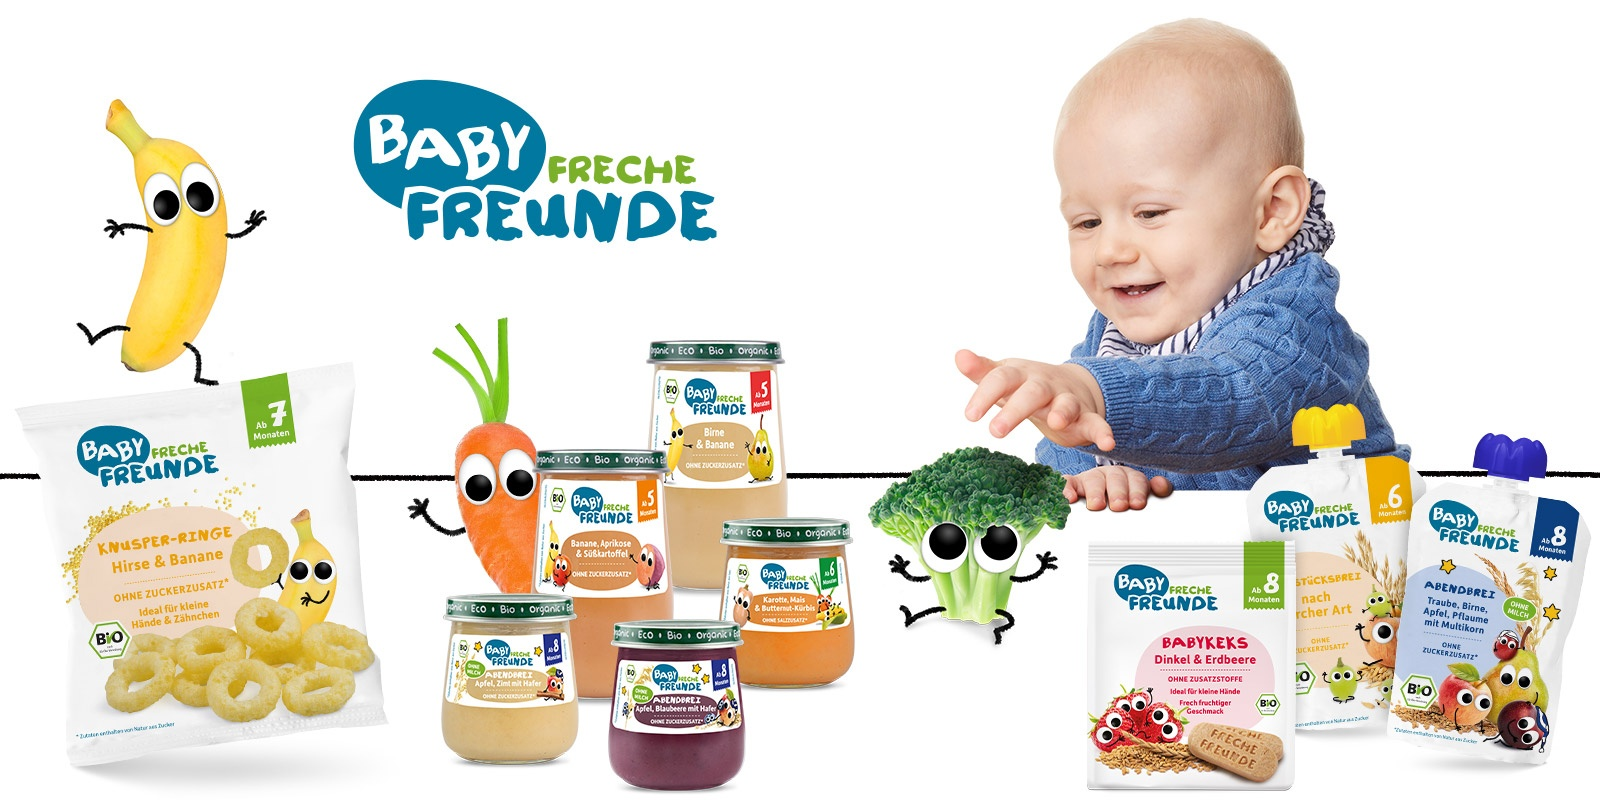 Baby Freche Freunde Babynahrung